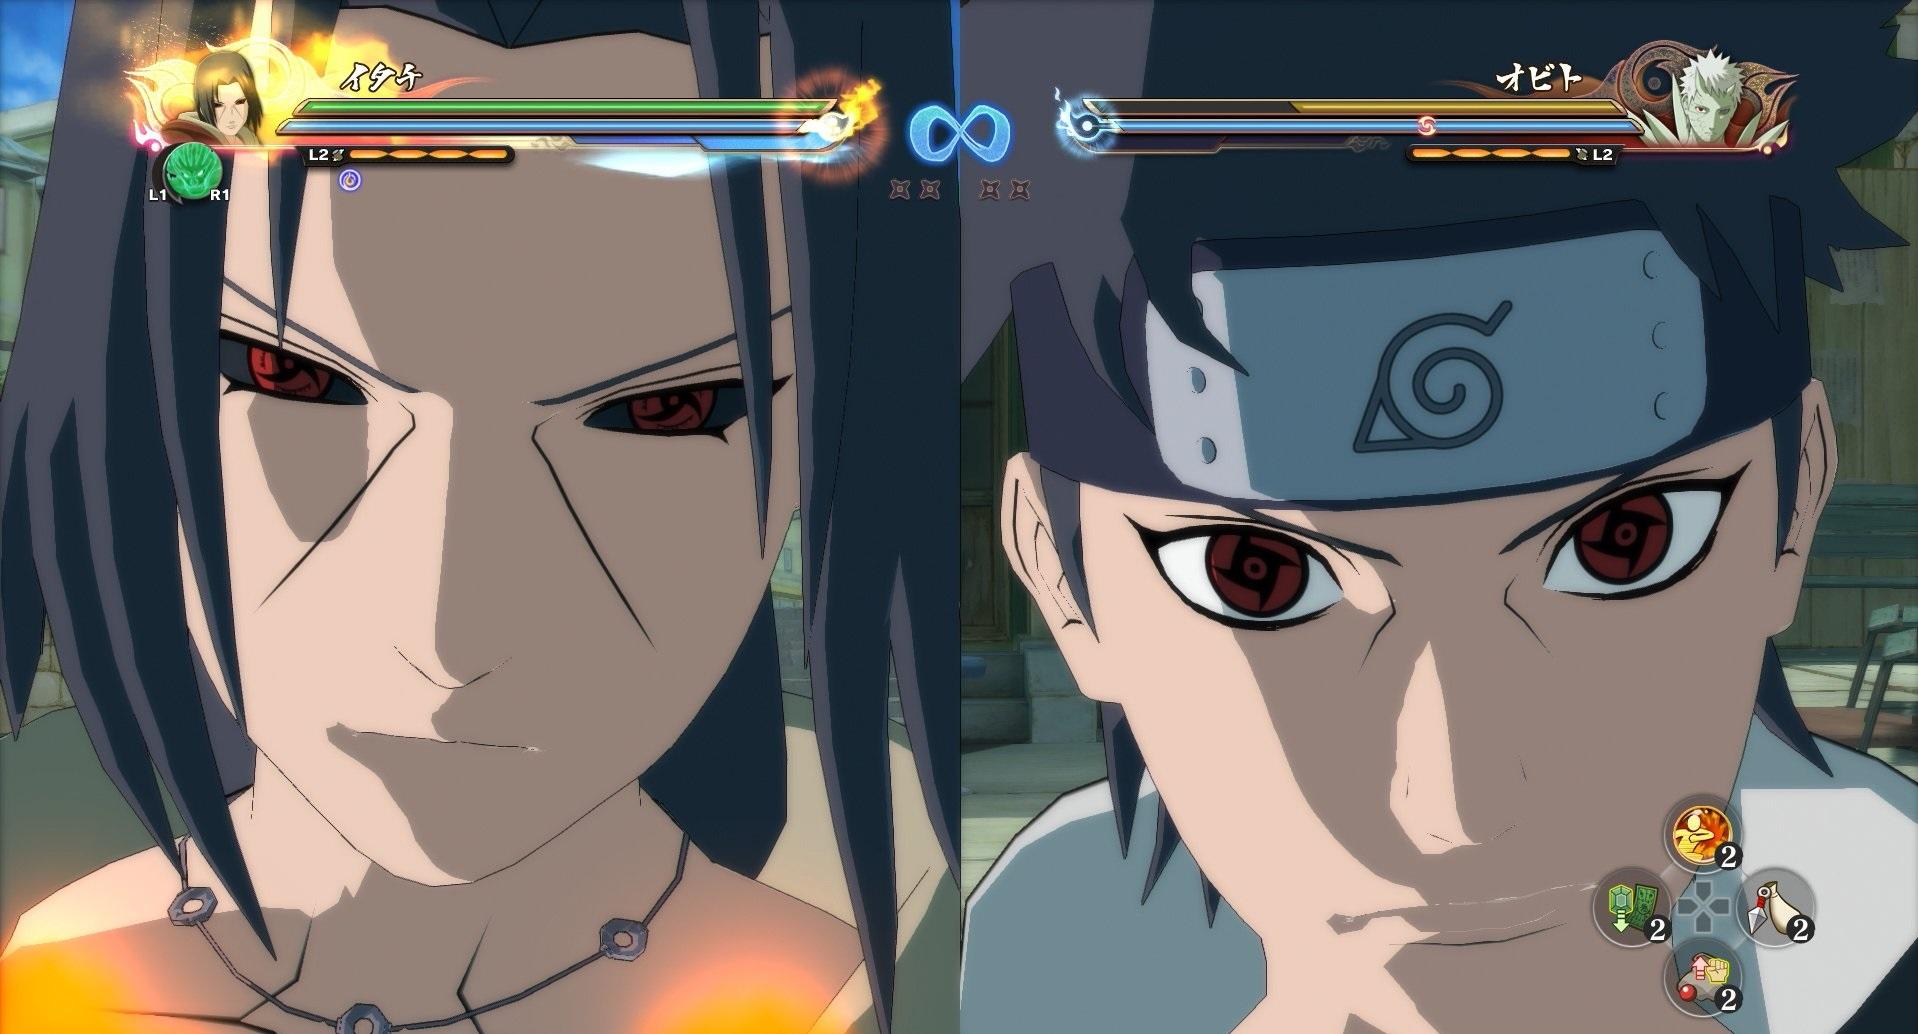 Naruto-Storm-4-3 Naruto Storm 4:Mükemmel Susanoo Shisui ve Itachi Ekran Görüntüleri